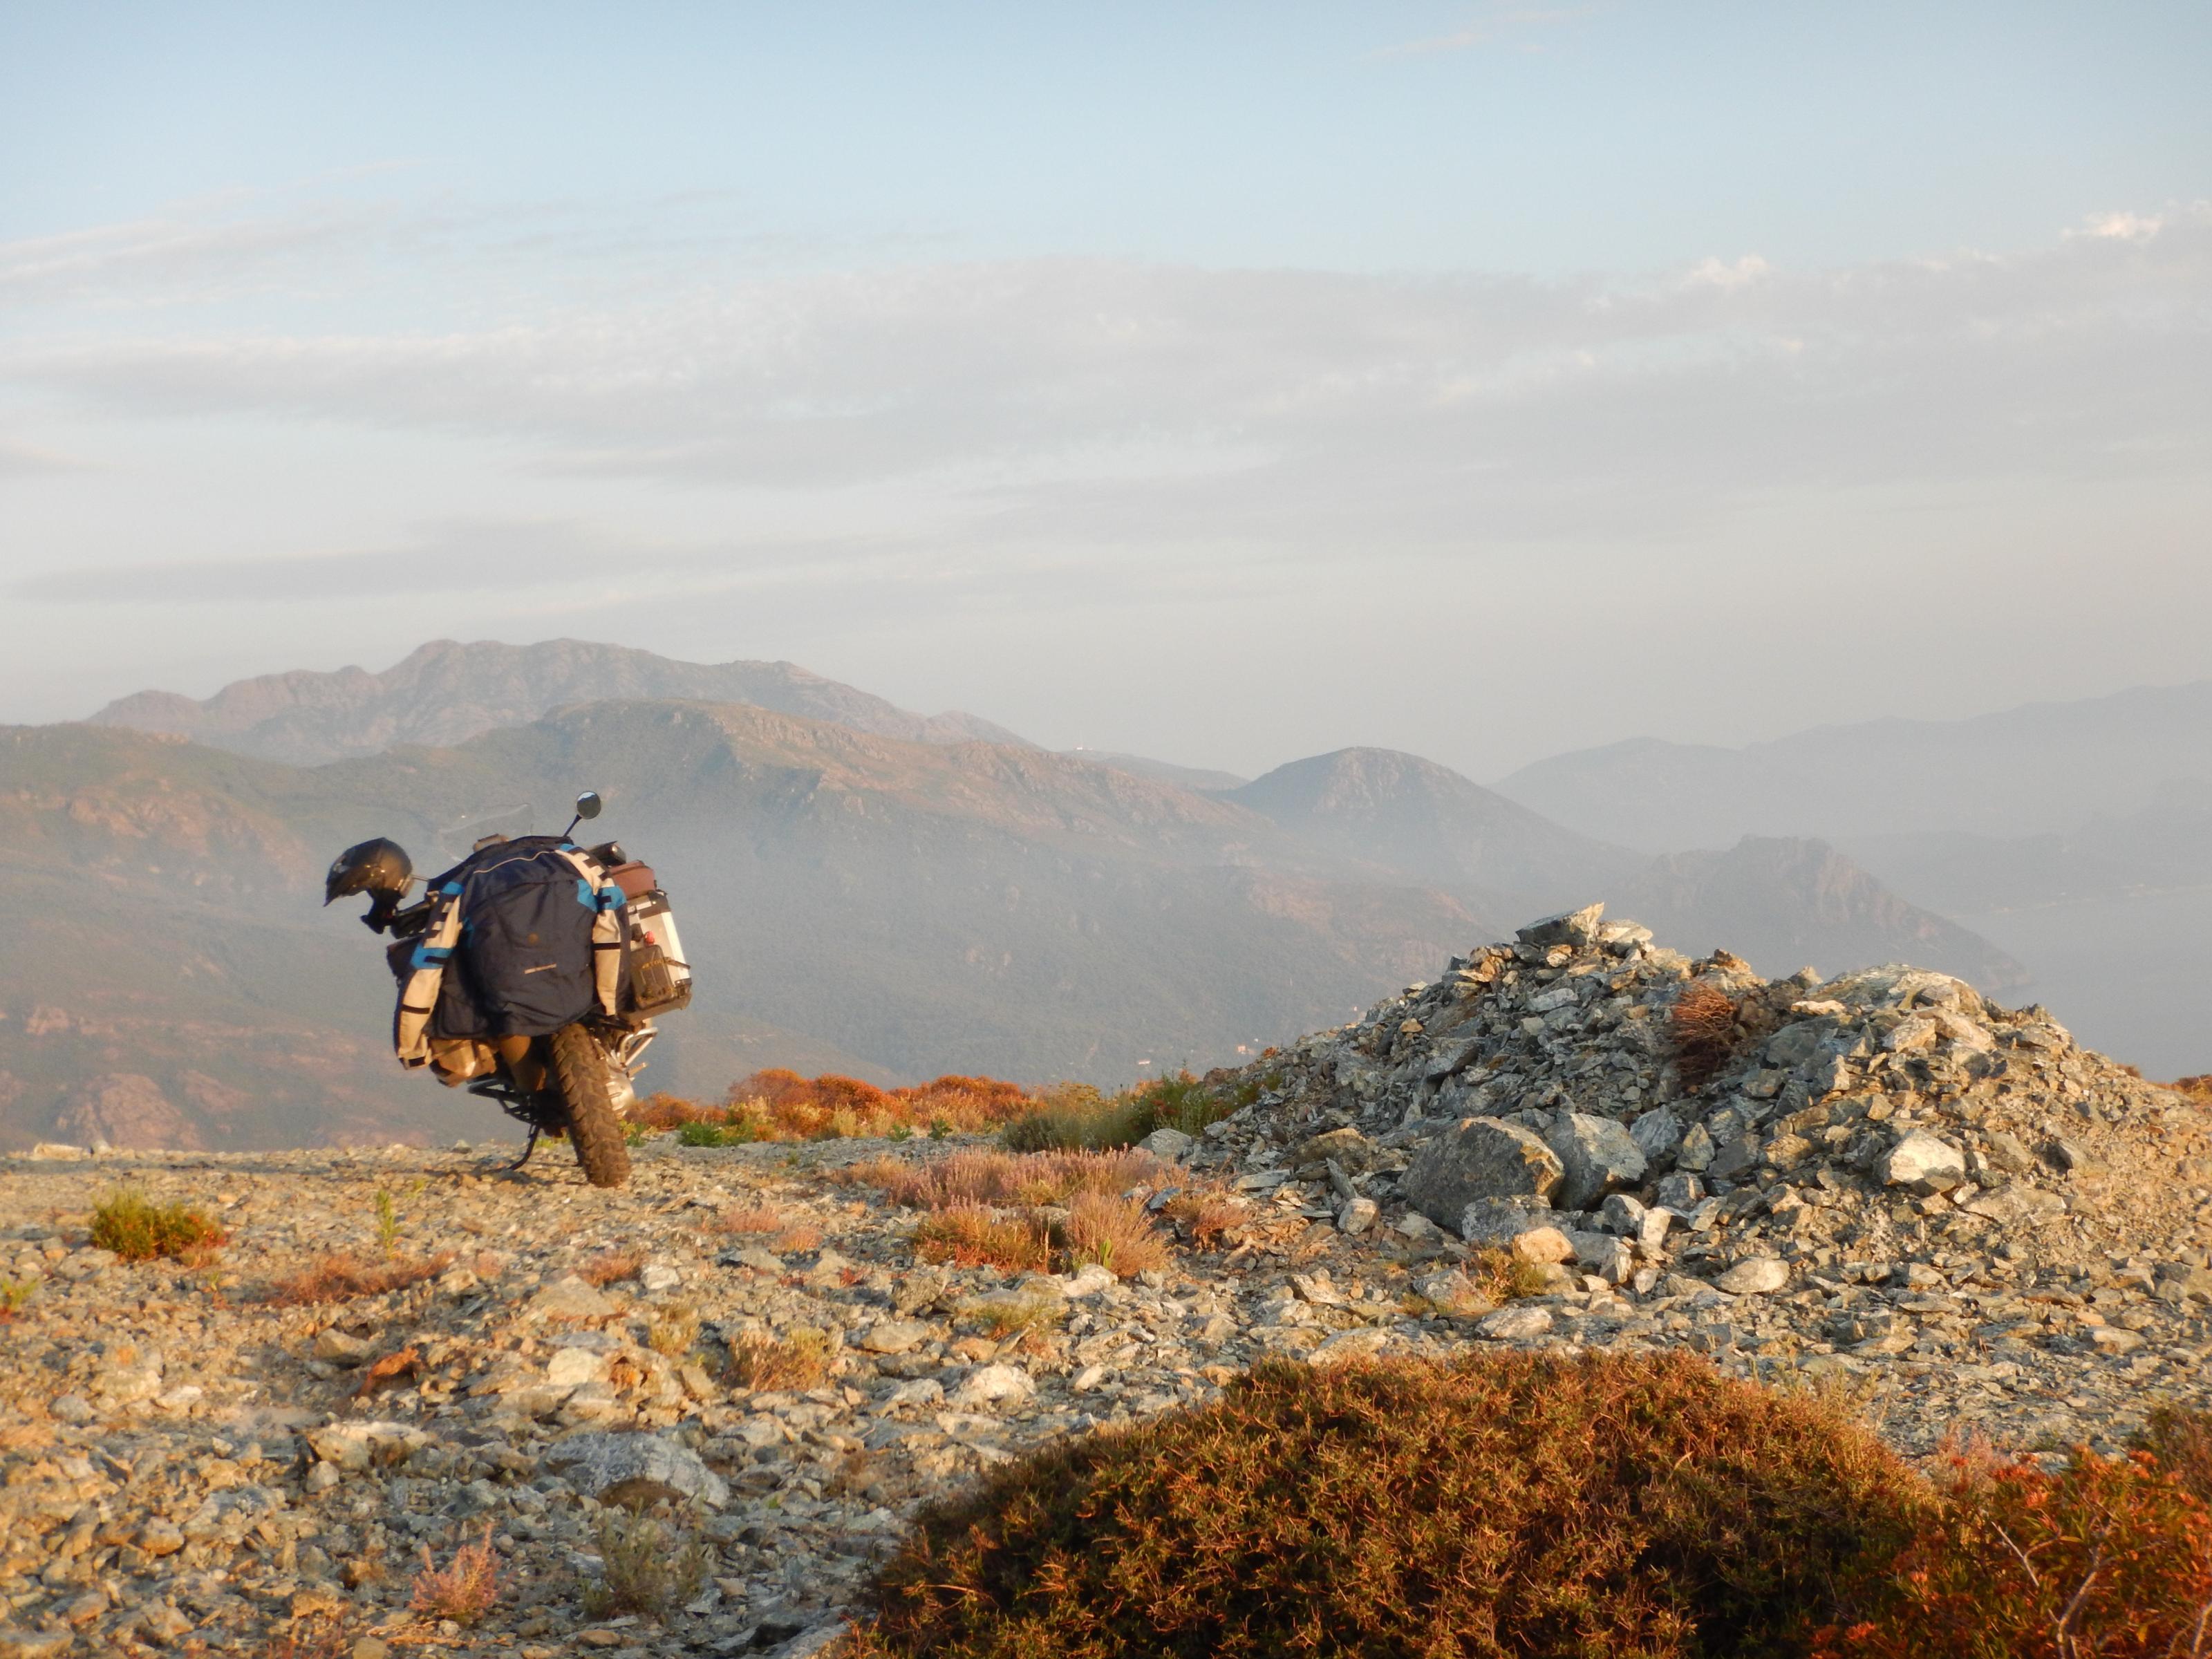 2016-07-05-korsika-plateau-natur-14-.jpg